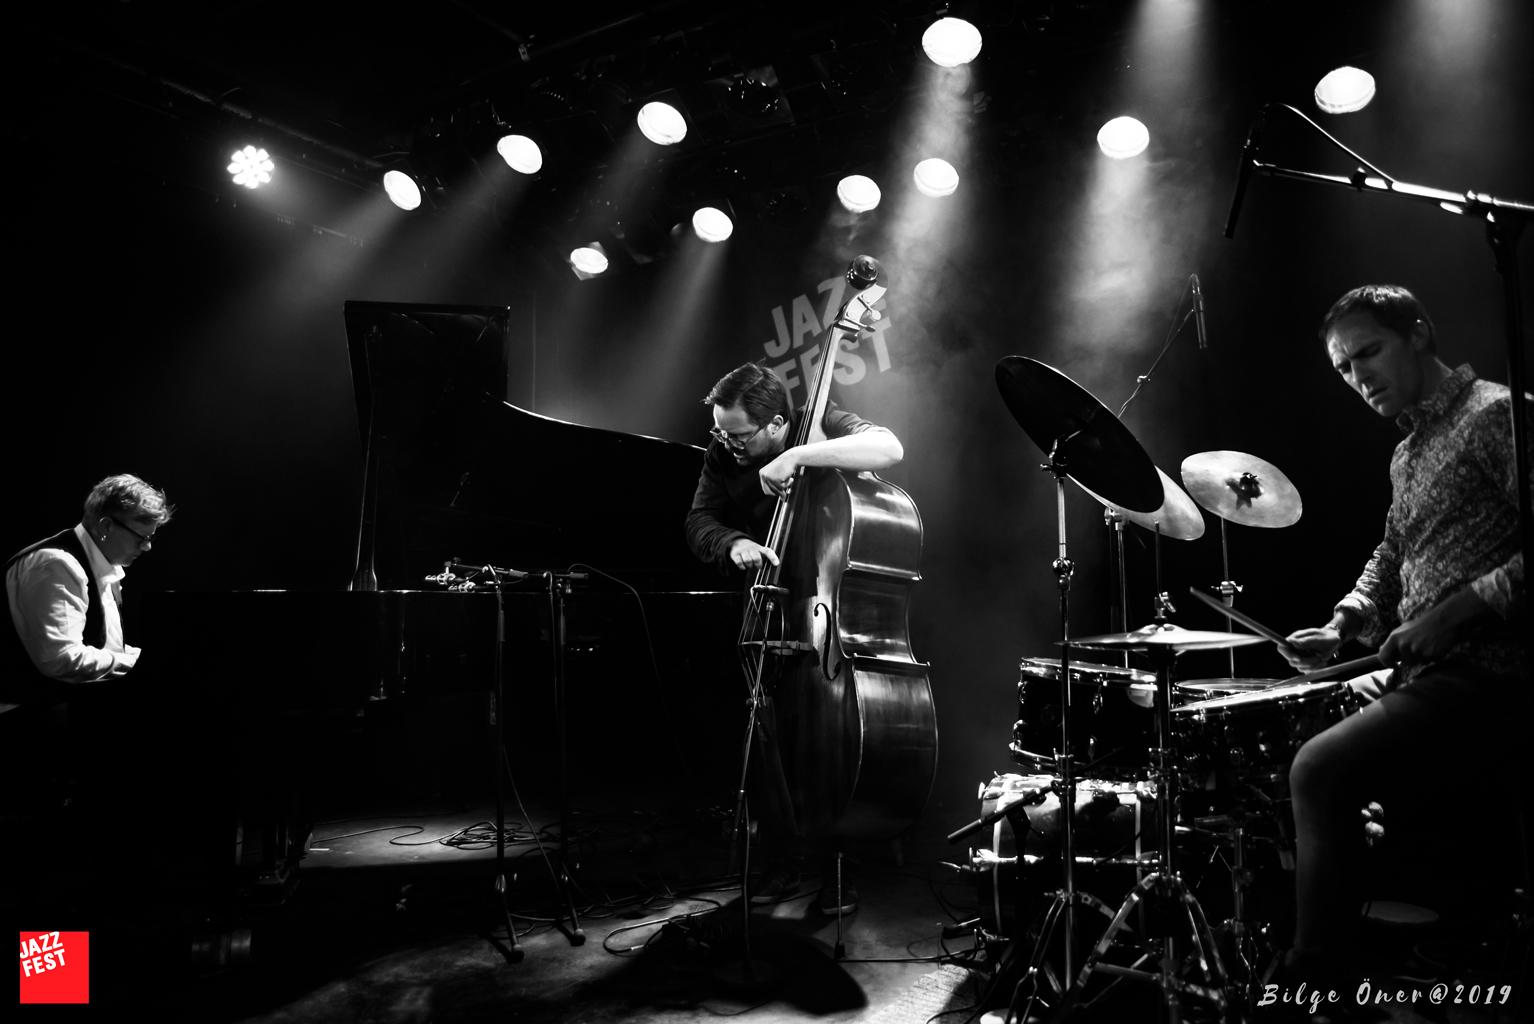 110519-Maria-Kannegaard-Trio-@-Studentsammfunnet-foto-Bilge-Öner-6.jpg